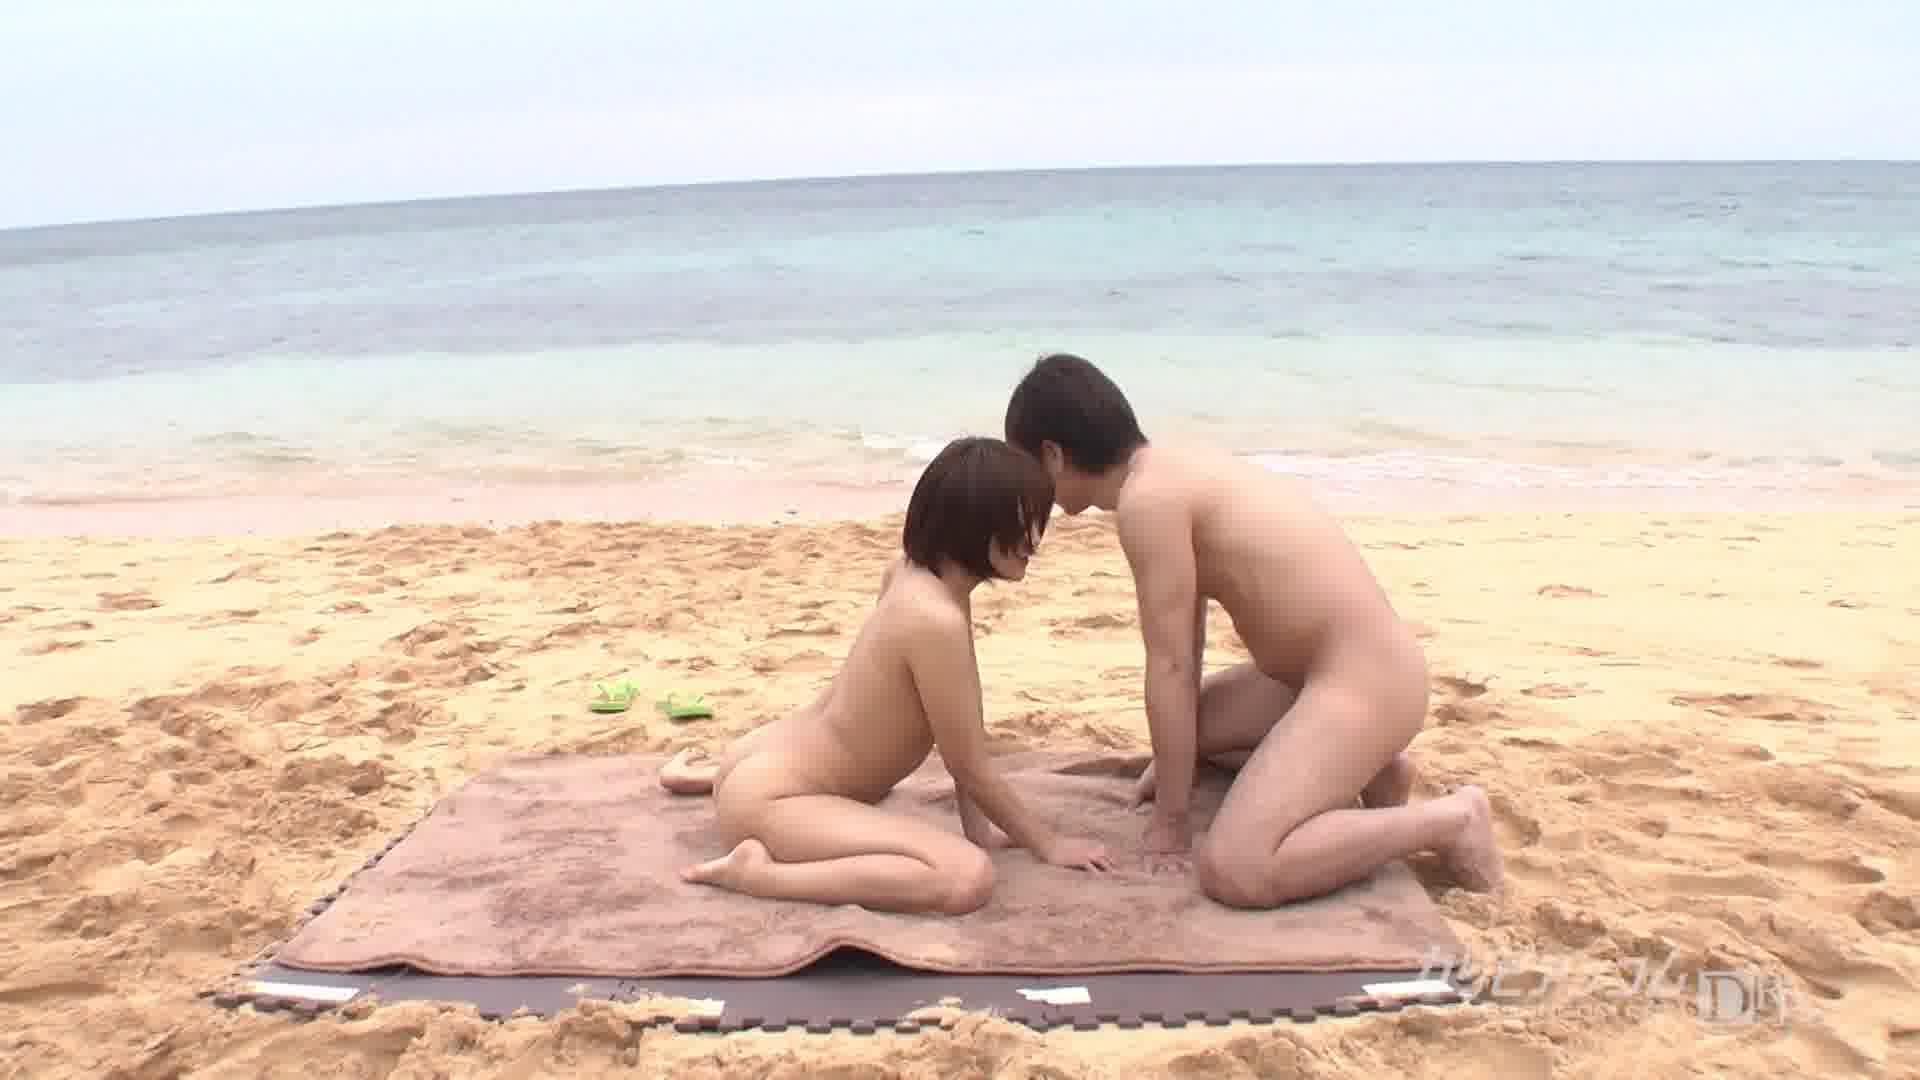 Sex on the Beach Saya - 立花さや【野外露出・潮吹き・中出し】